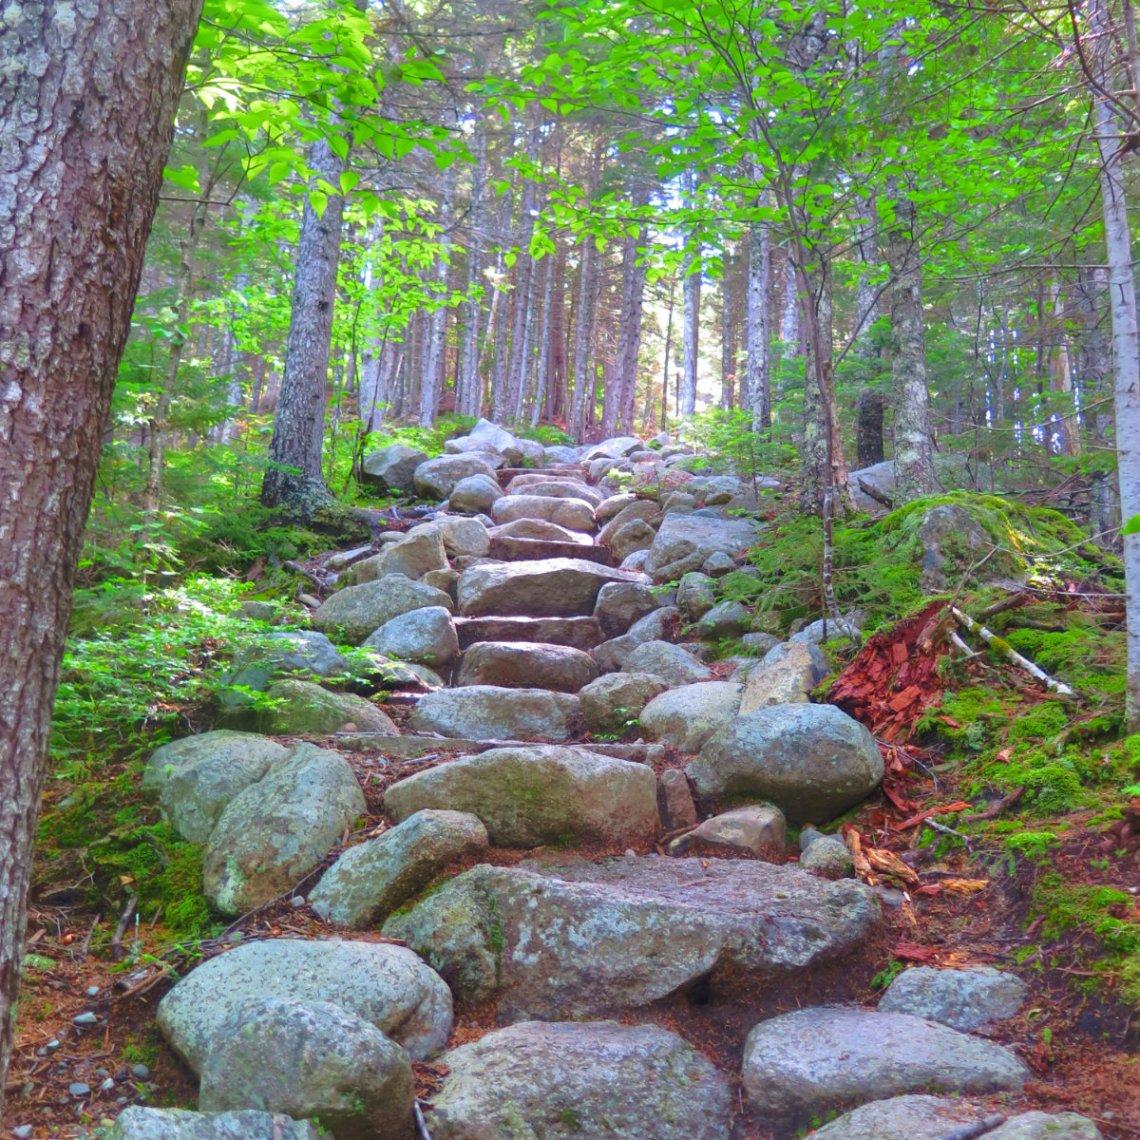 Hunt-Trail-Stone-Stairs-Katahdin-BSP-20190703